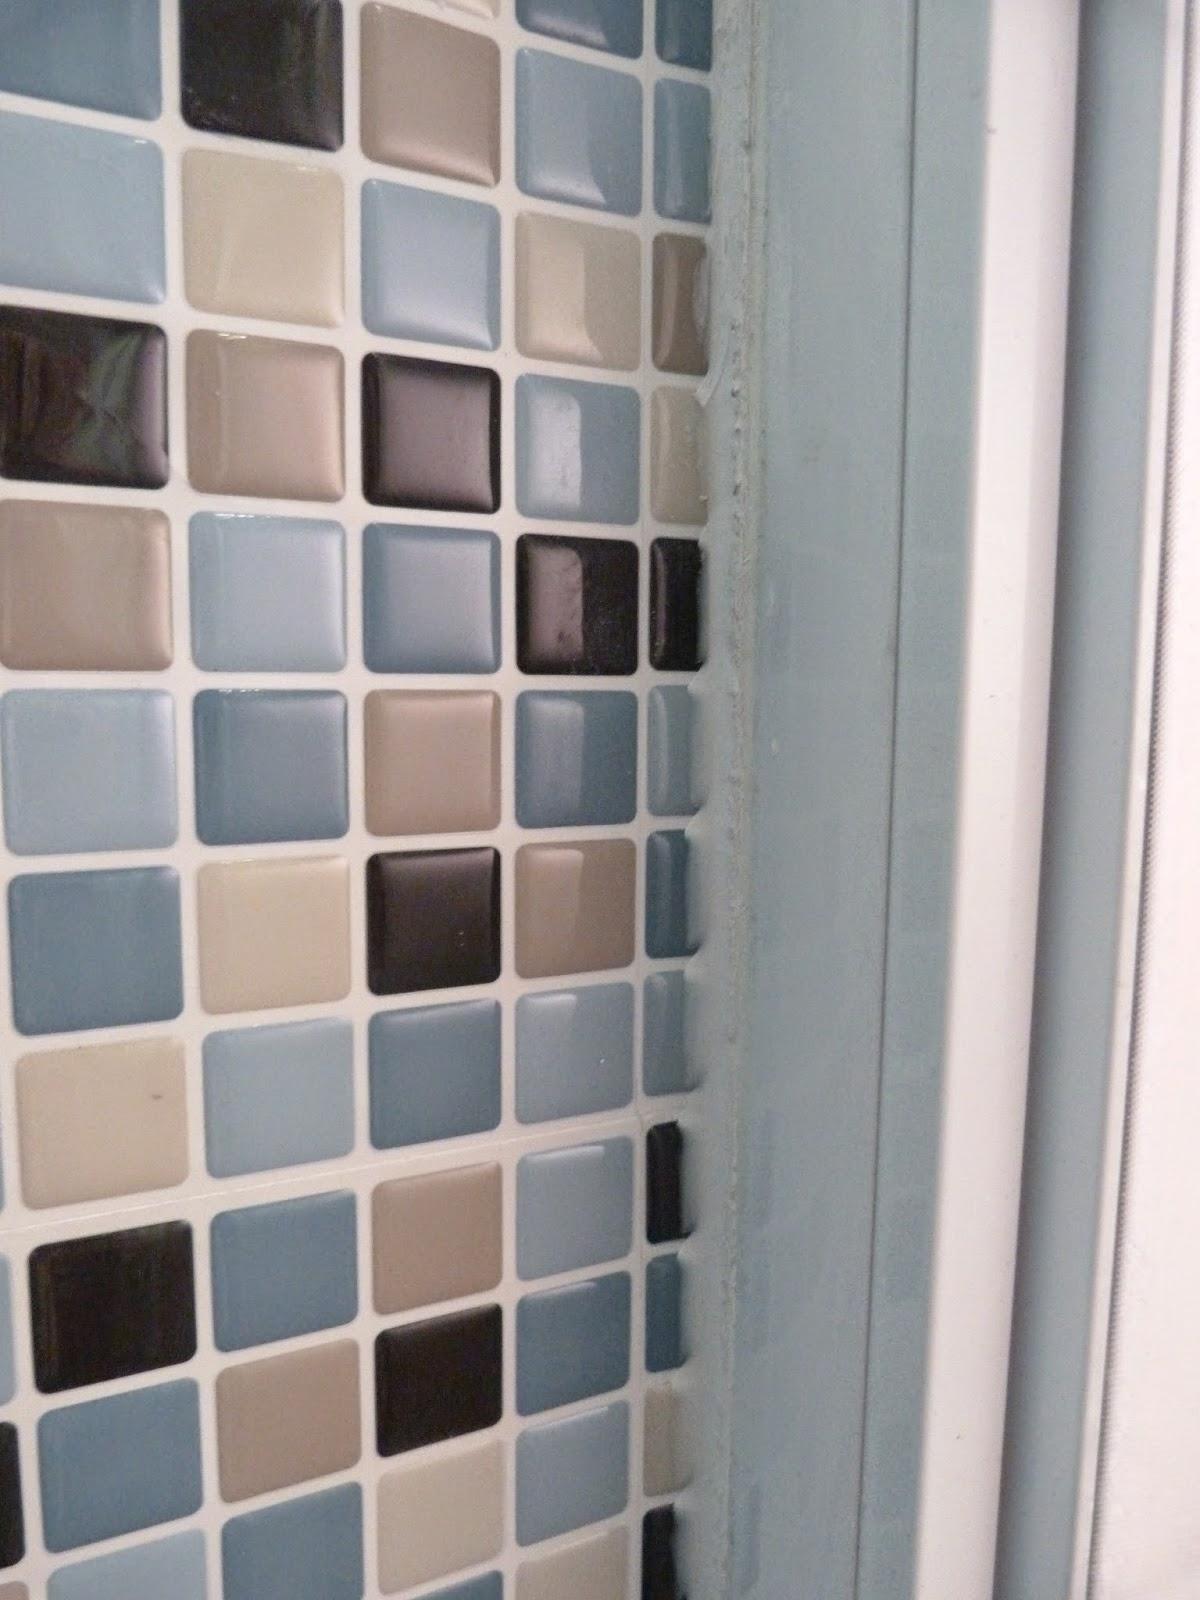 Joint noir salle de bain: nettoyer salle de bain savon noir ...